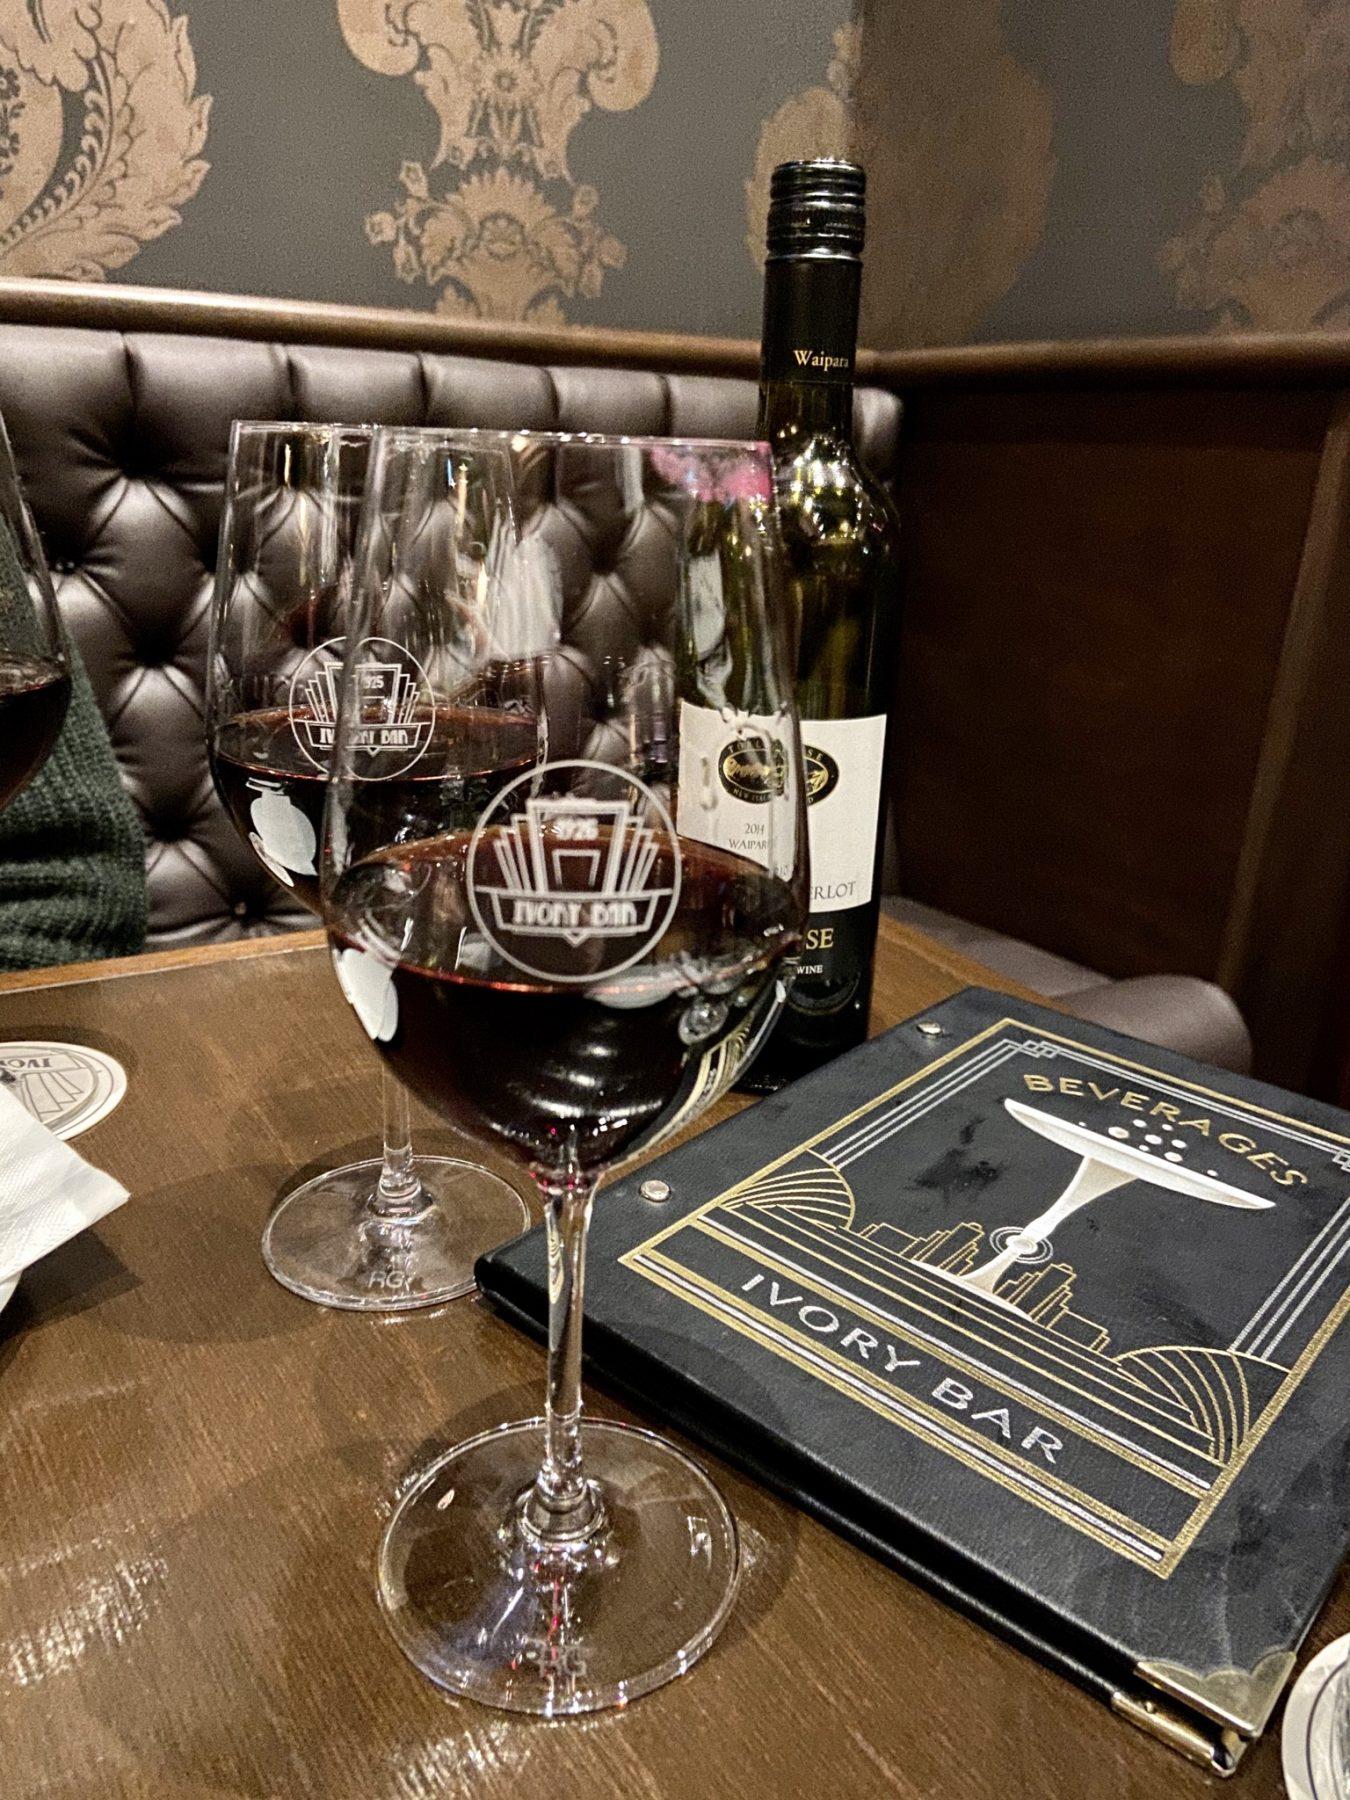 Ivory Bar Rangiora Wine Glasses Drinks Menu